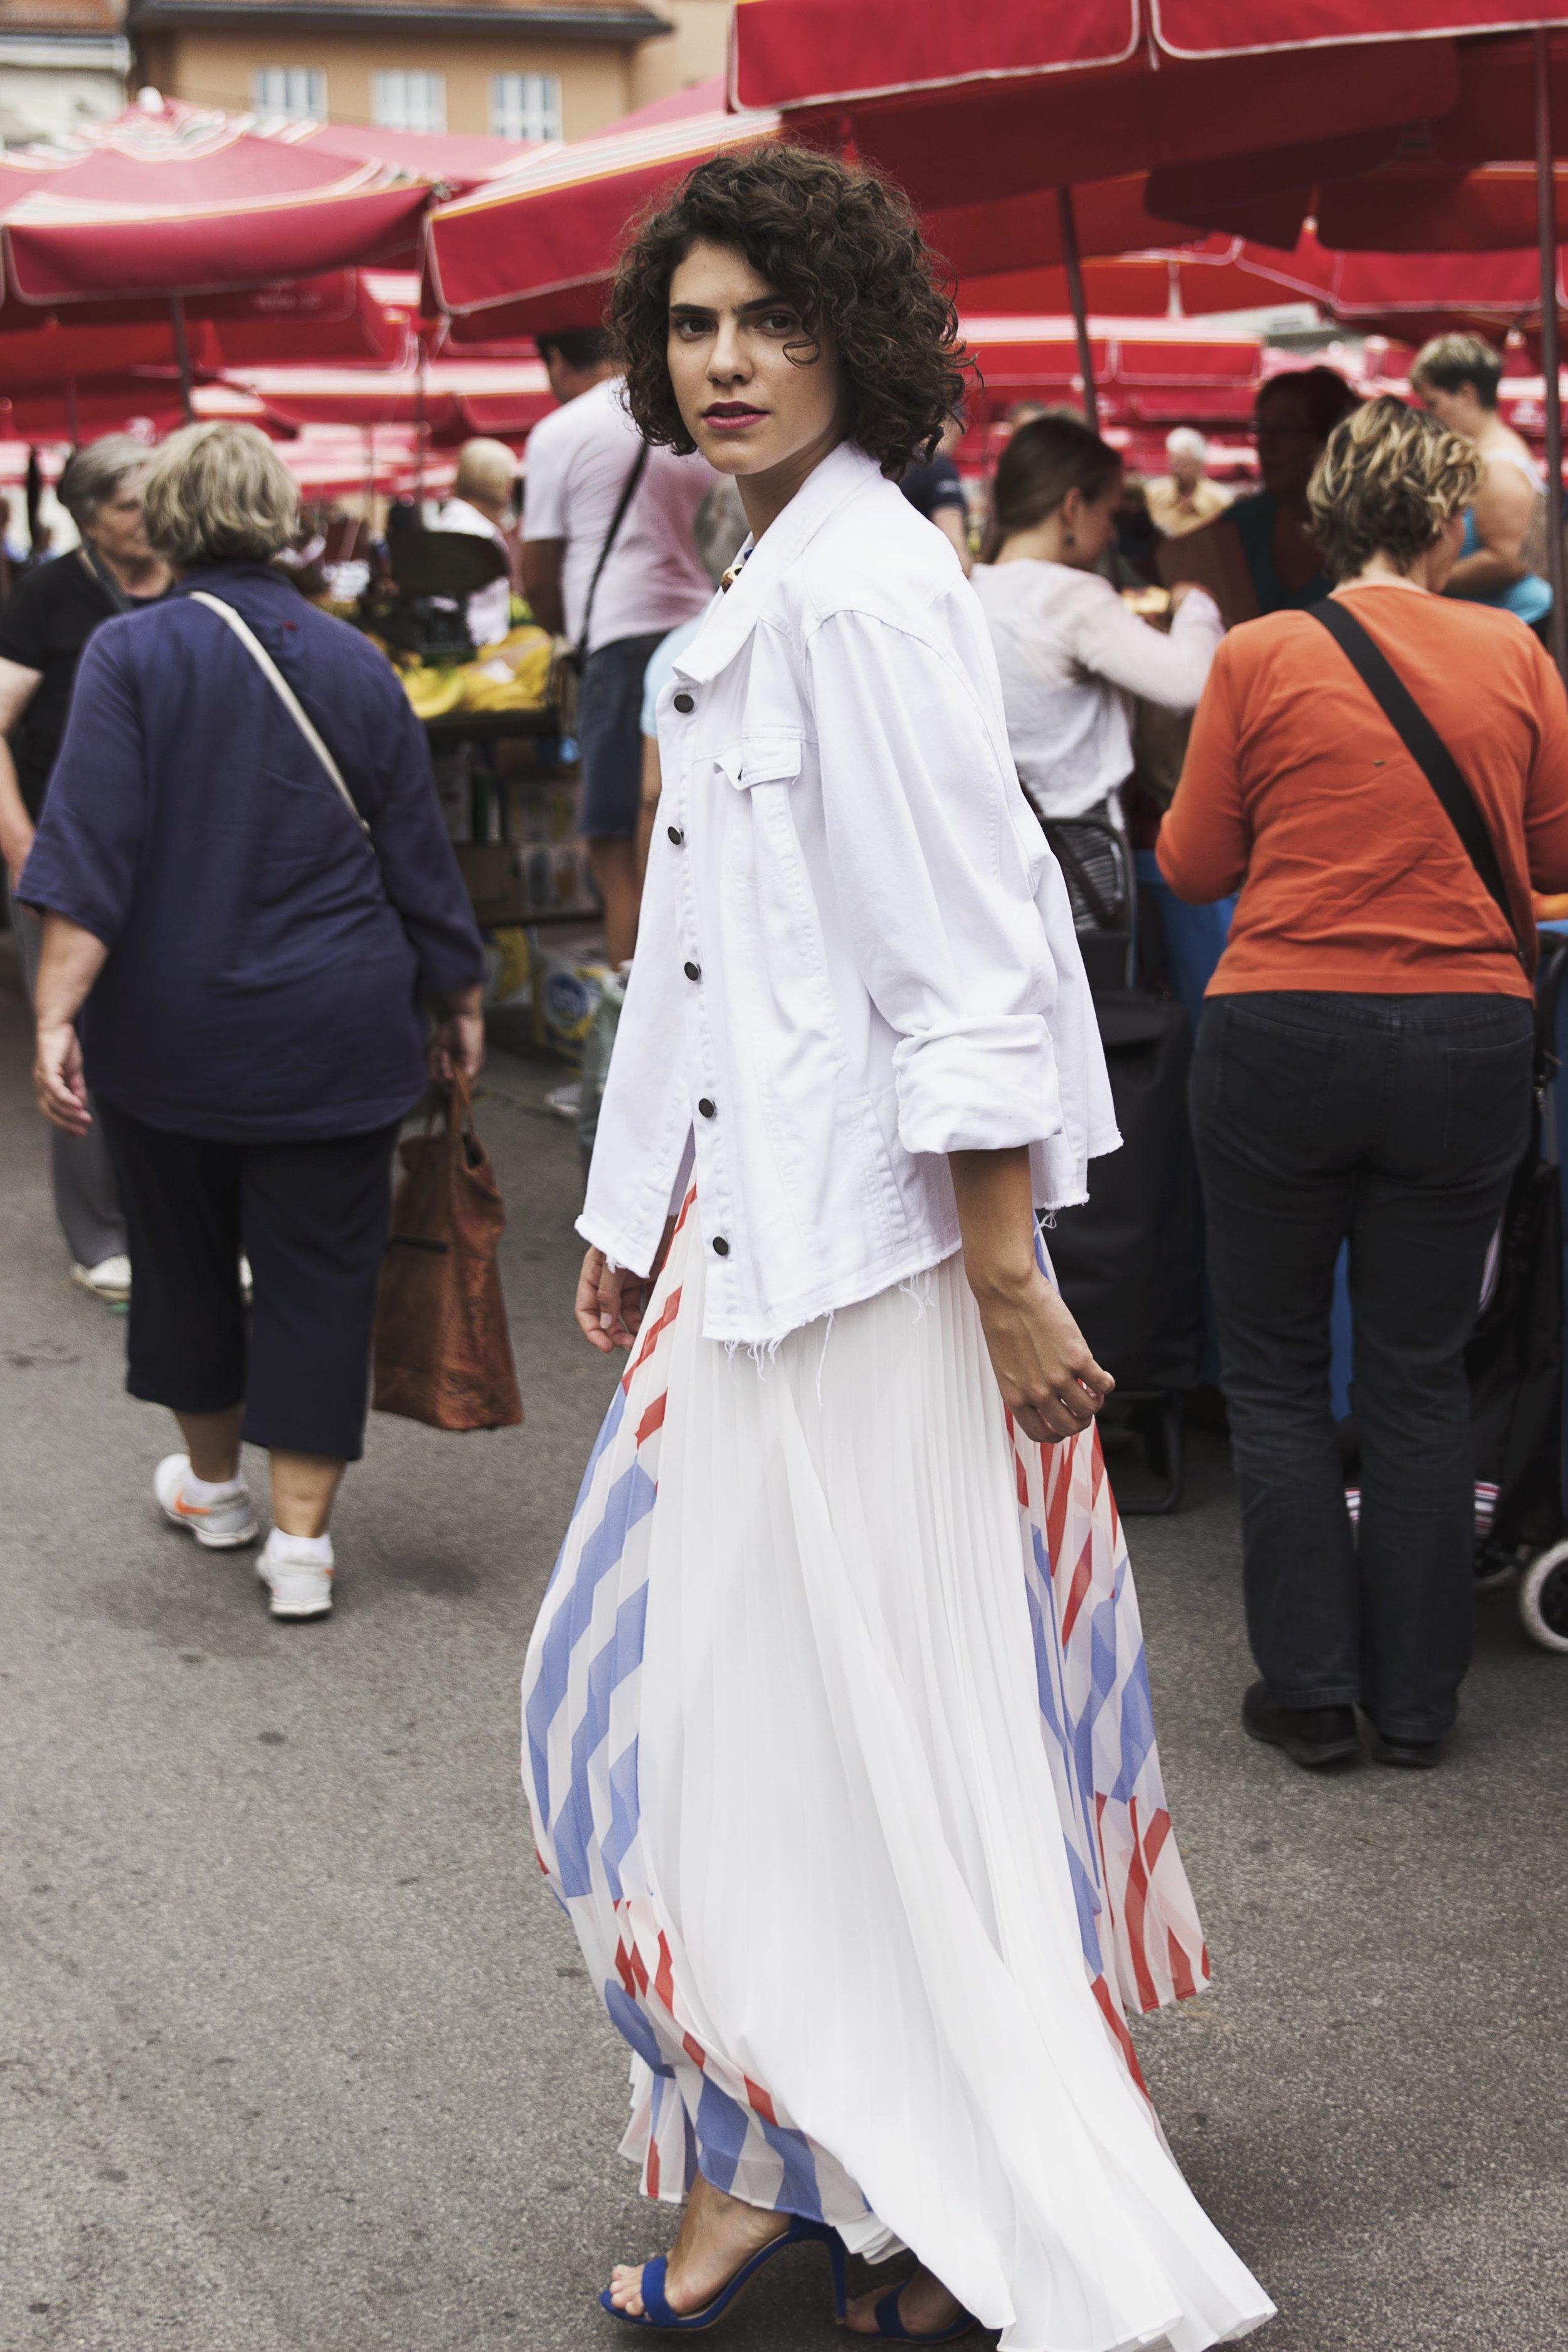 luka-lajic-fashion-photography-robert-sever-dizajner-croatian (16).jpg